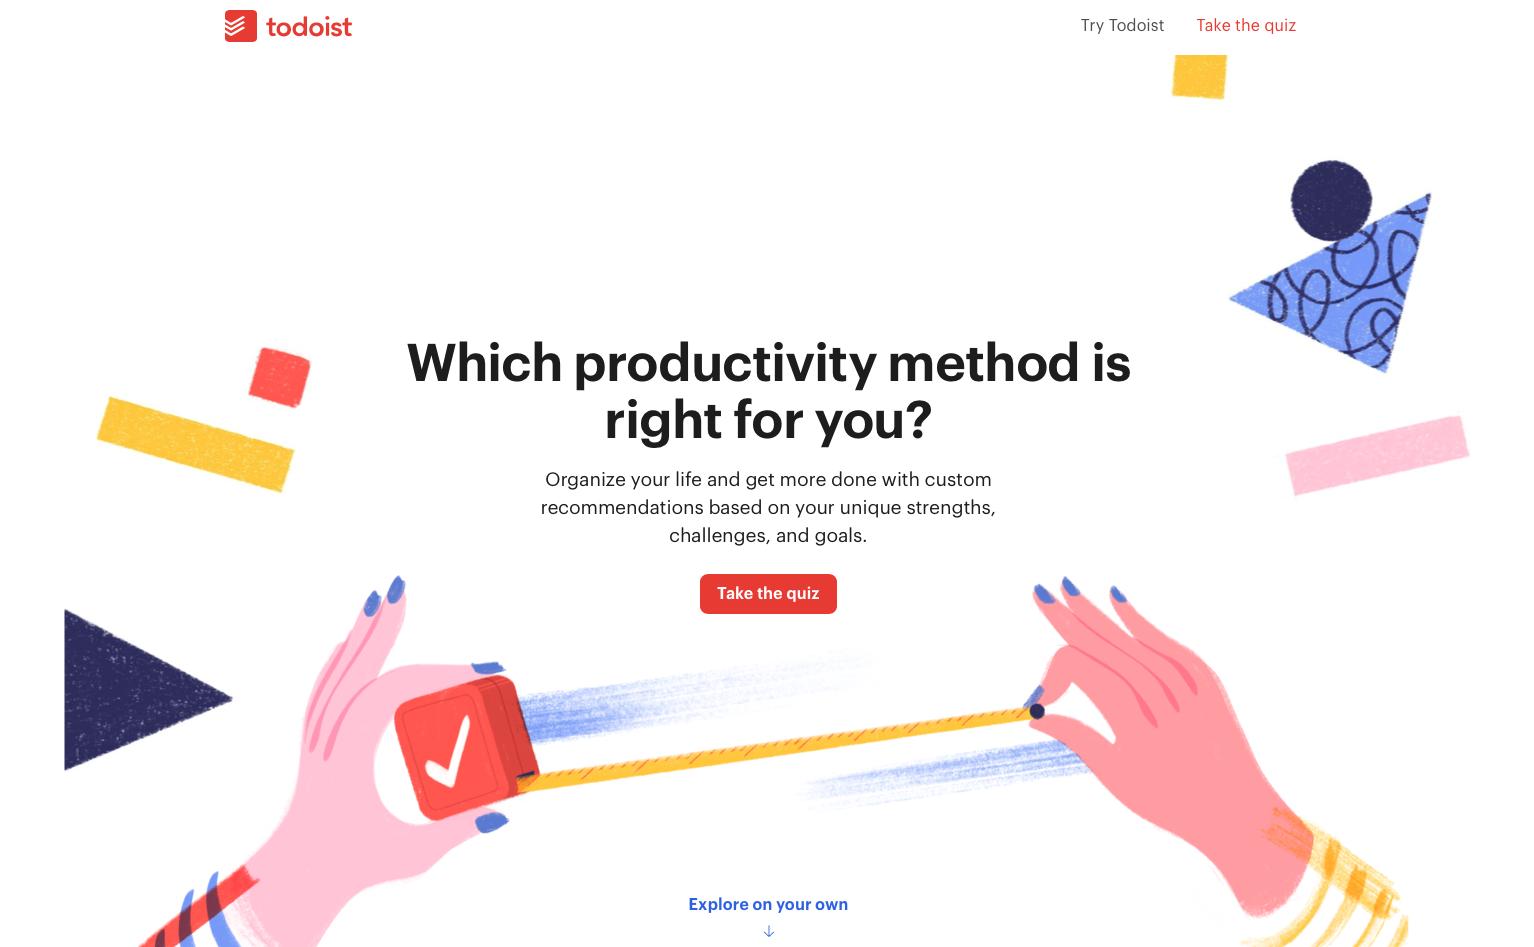 Todoist's Productivity Methods quiz